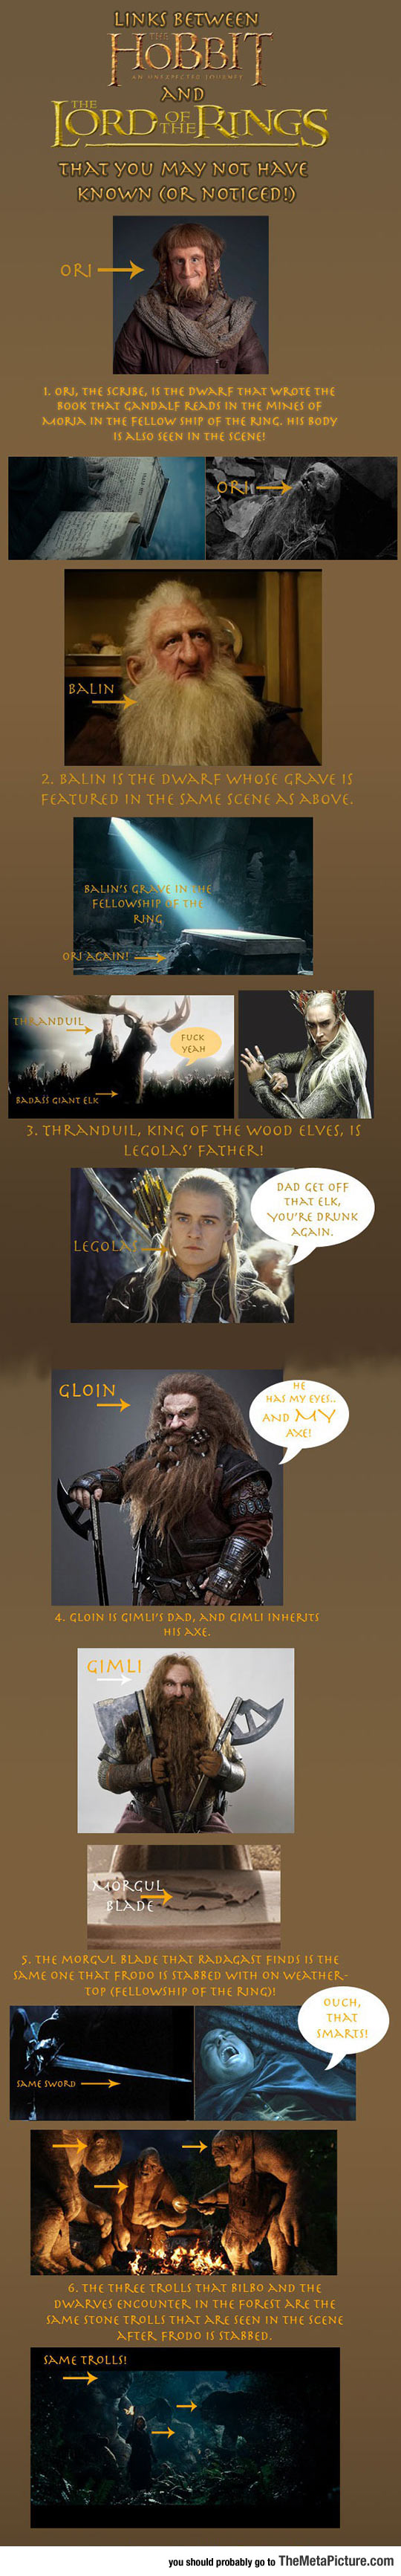 cool-LOTR-The-Hobbit-link-spoiler